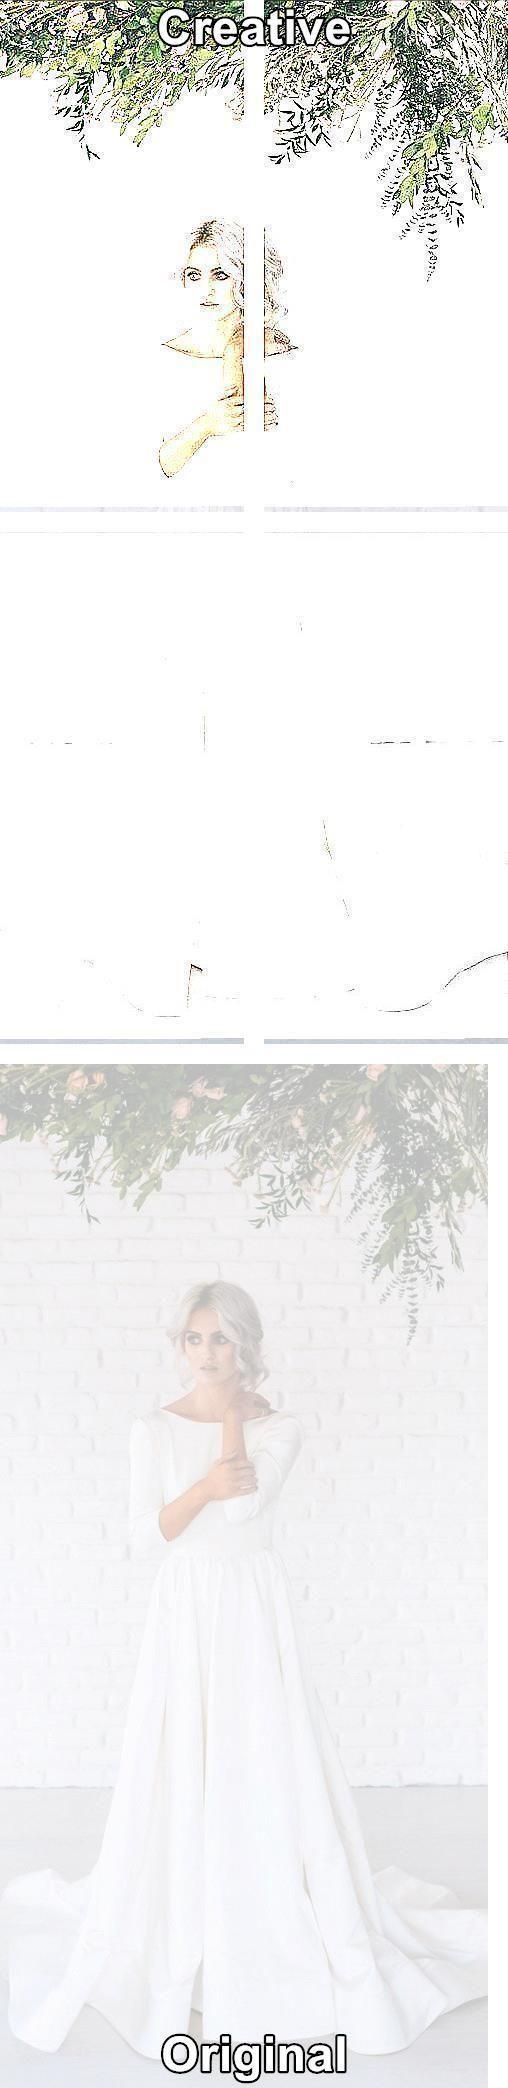 Pink Wedding Dress   Grecian Wedding Dress   Wedding Poems #grecianweddingdresses Pink Wedding Dress   Grecian Wedding Dress   Wedding Poems #greekweddingdresses Pink Wedding Dress   Grecian Wedding Dress   Wedding Poems #grecianweddingdresses Pink Wedding Dress   Grecian Wedding Dress   Wedding Poems #grecianweddingdresses